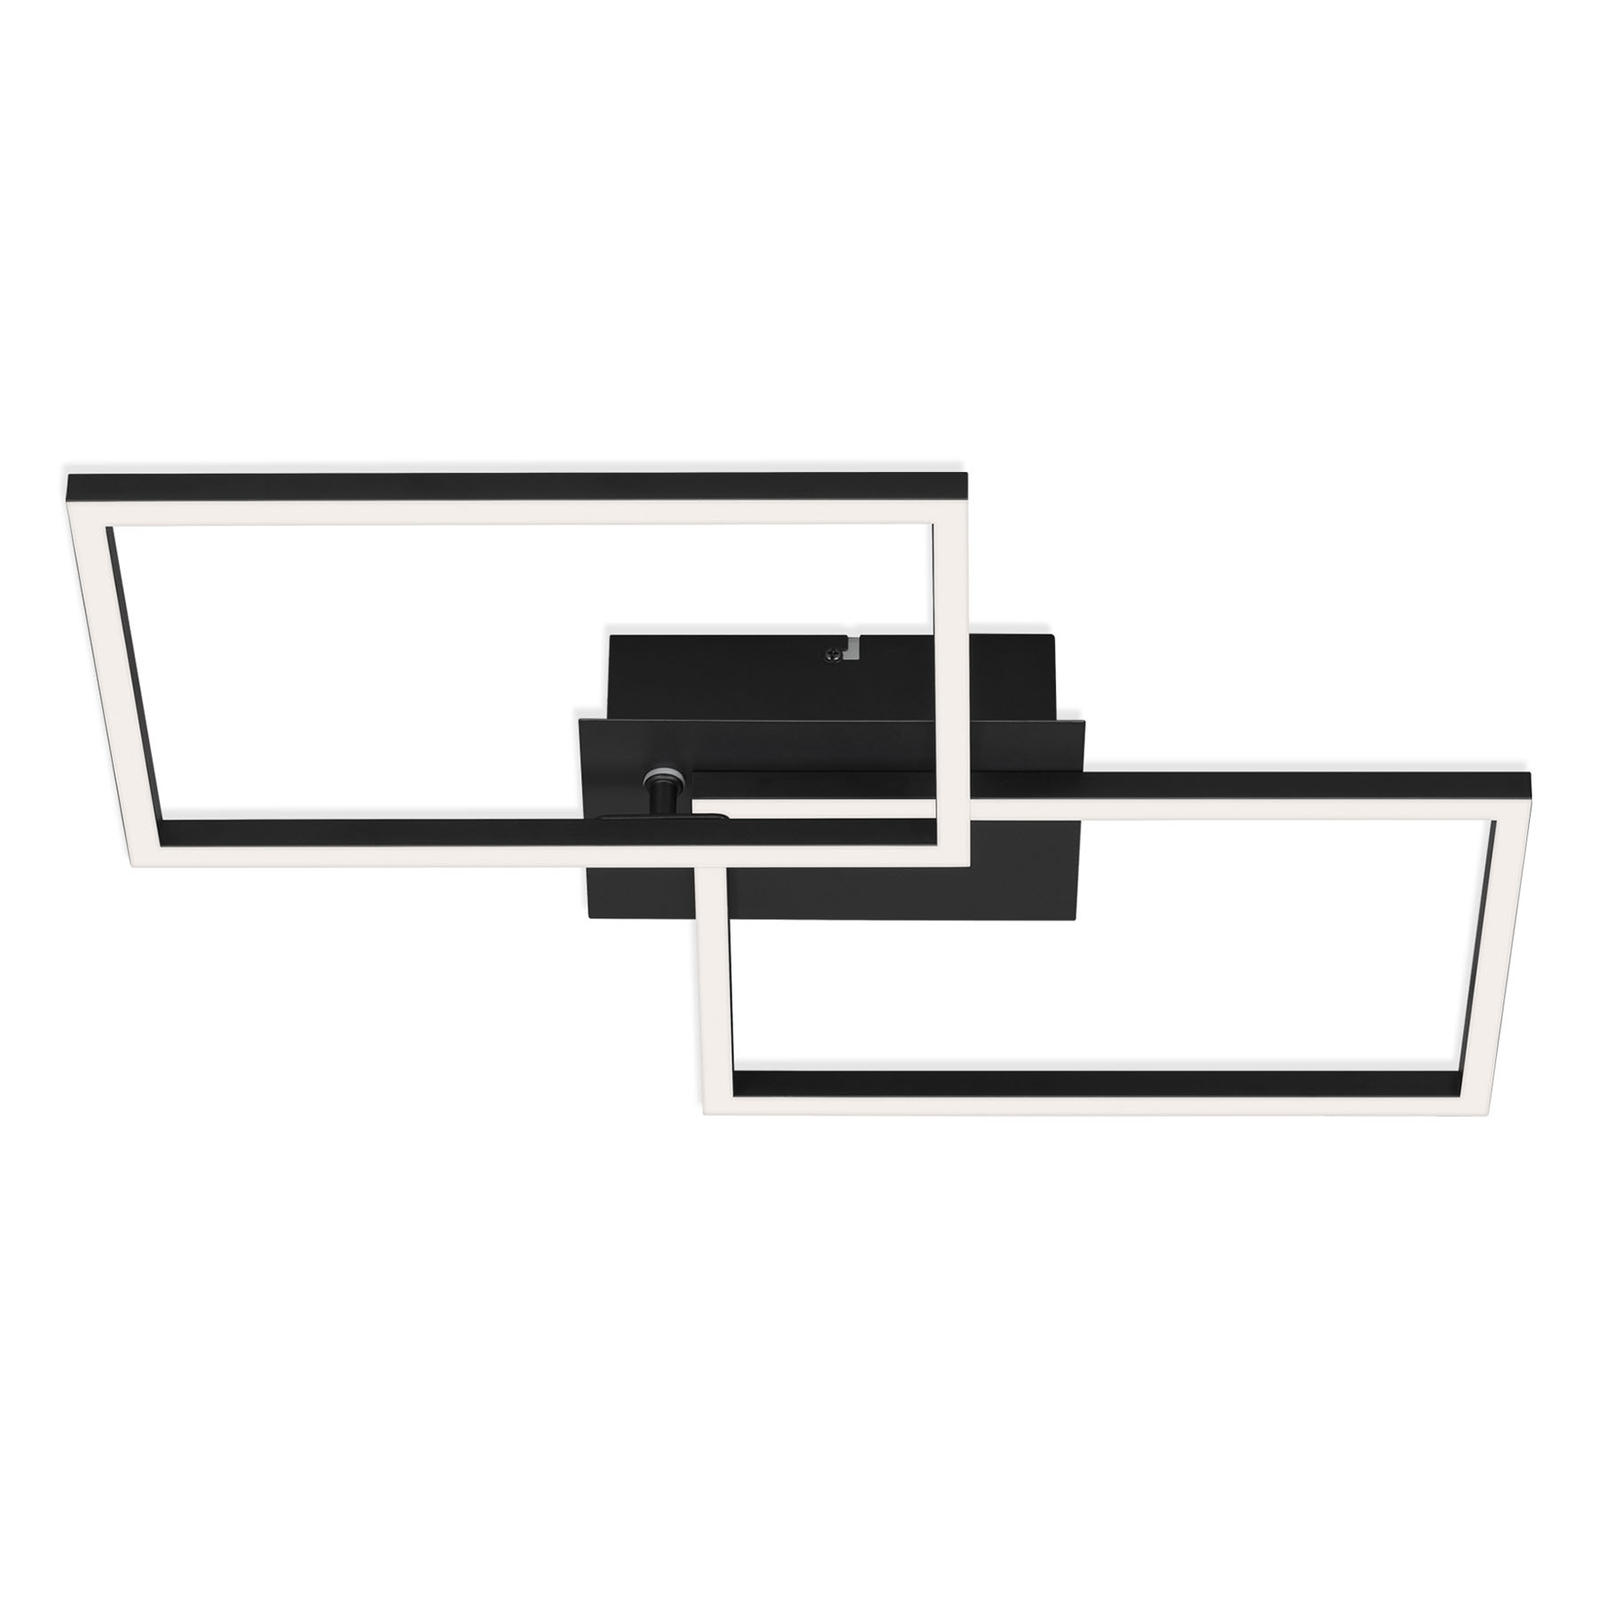 LED plafondlamp Frame CCT, zwart, 50x39cm